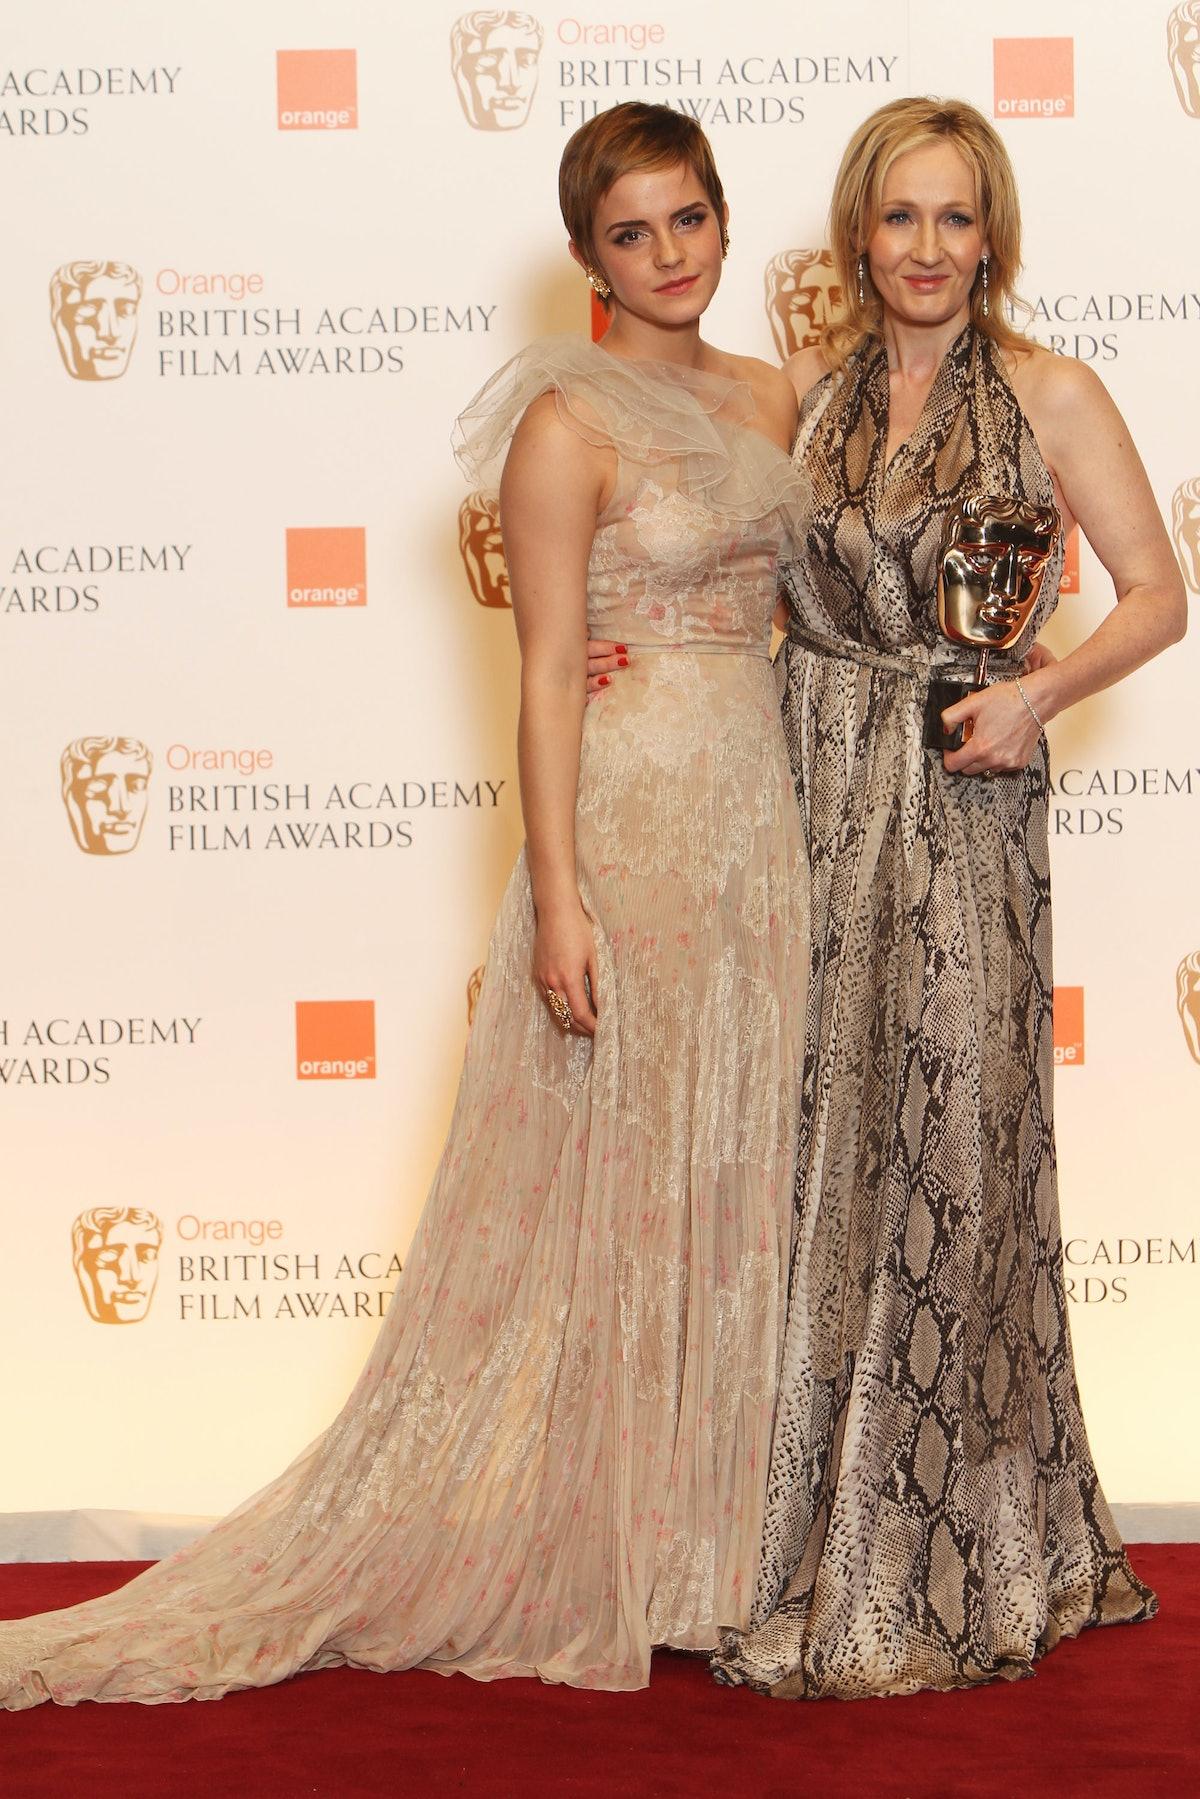 Orange British Academy Film Awards - Winners Boards